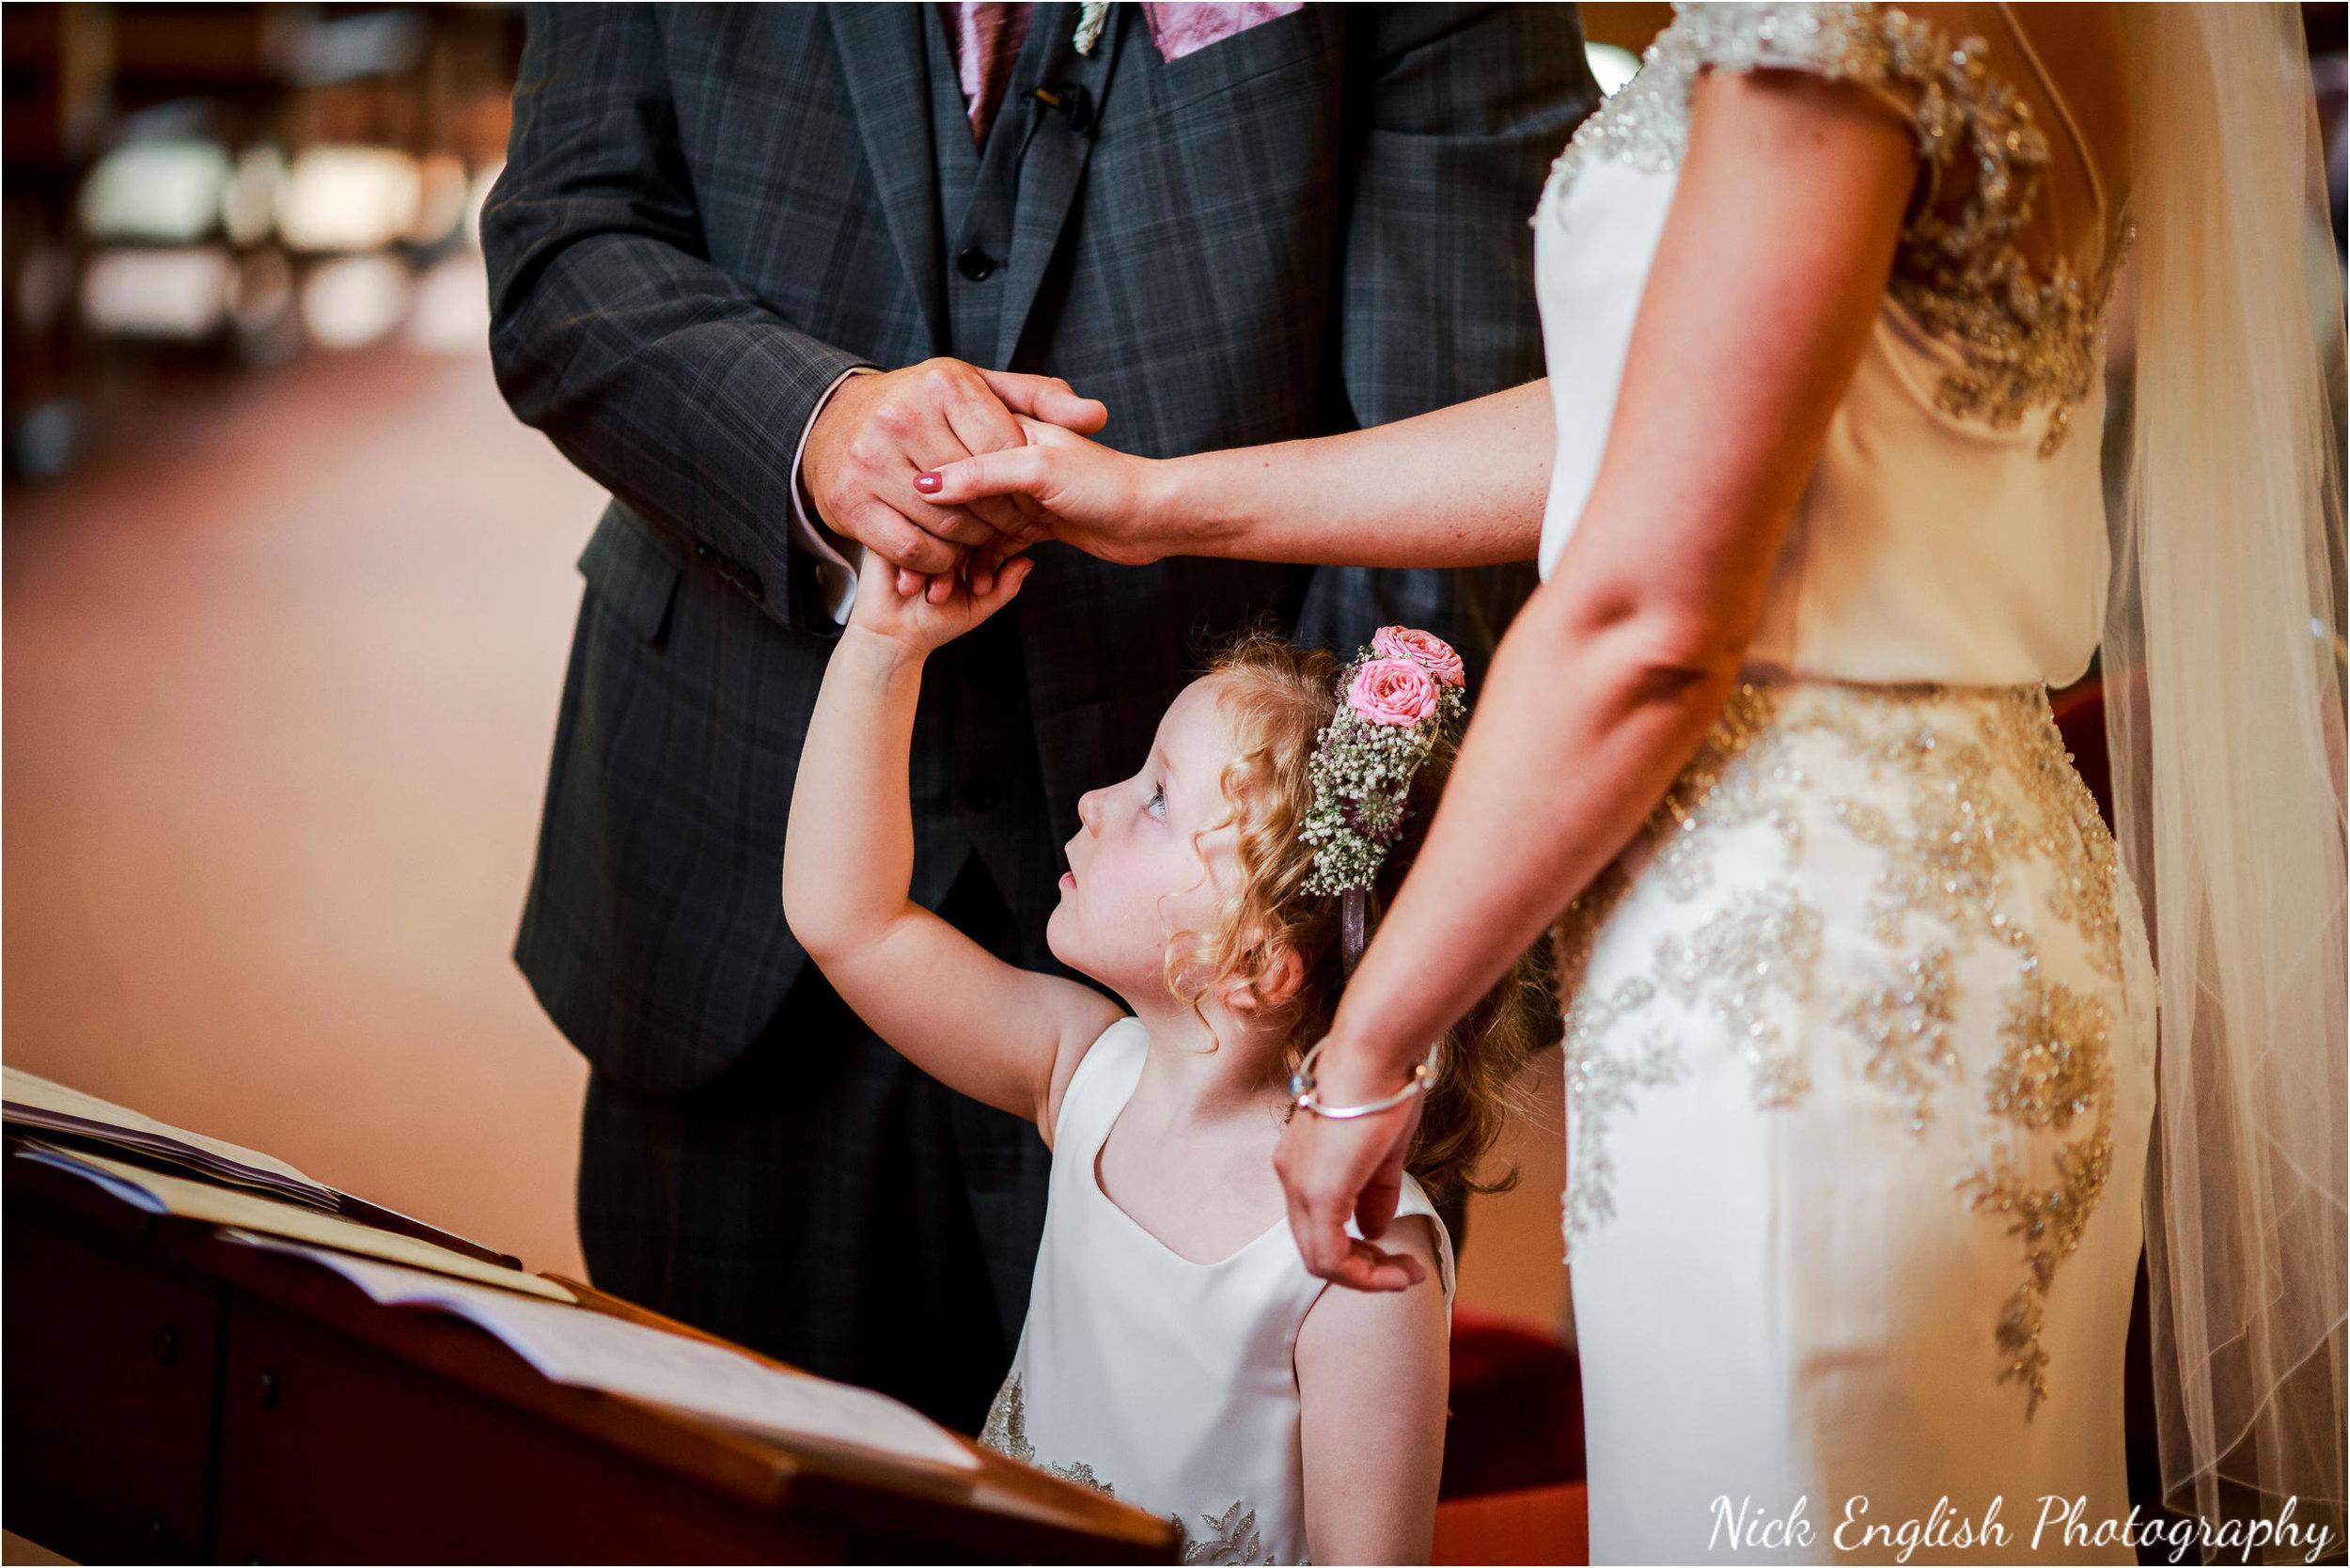 Stacey-Ash-Wedding-Photographs-Stanley-House-Preston-Lancashire-60.jpg